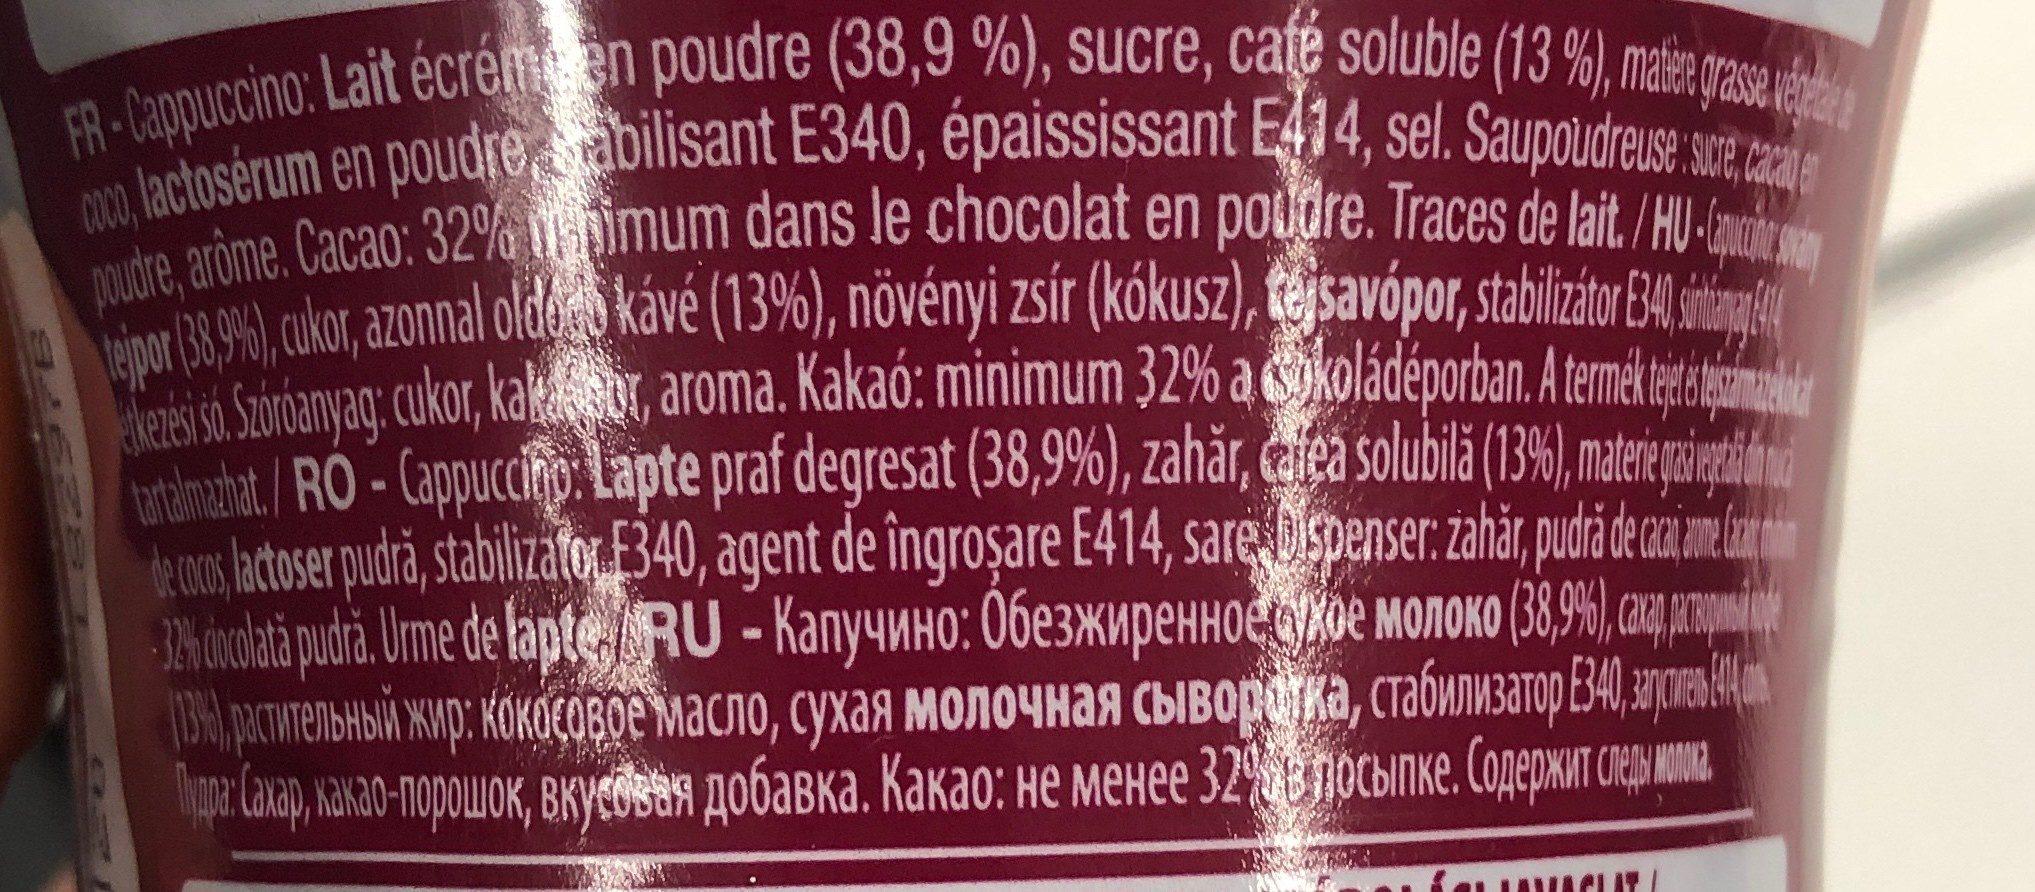 Cappuccino - Ingrédients